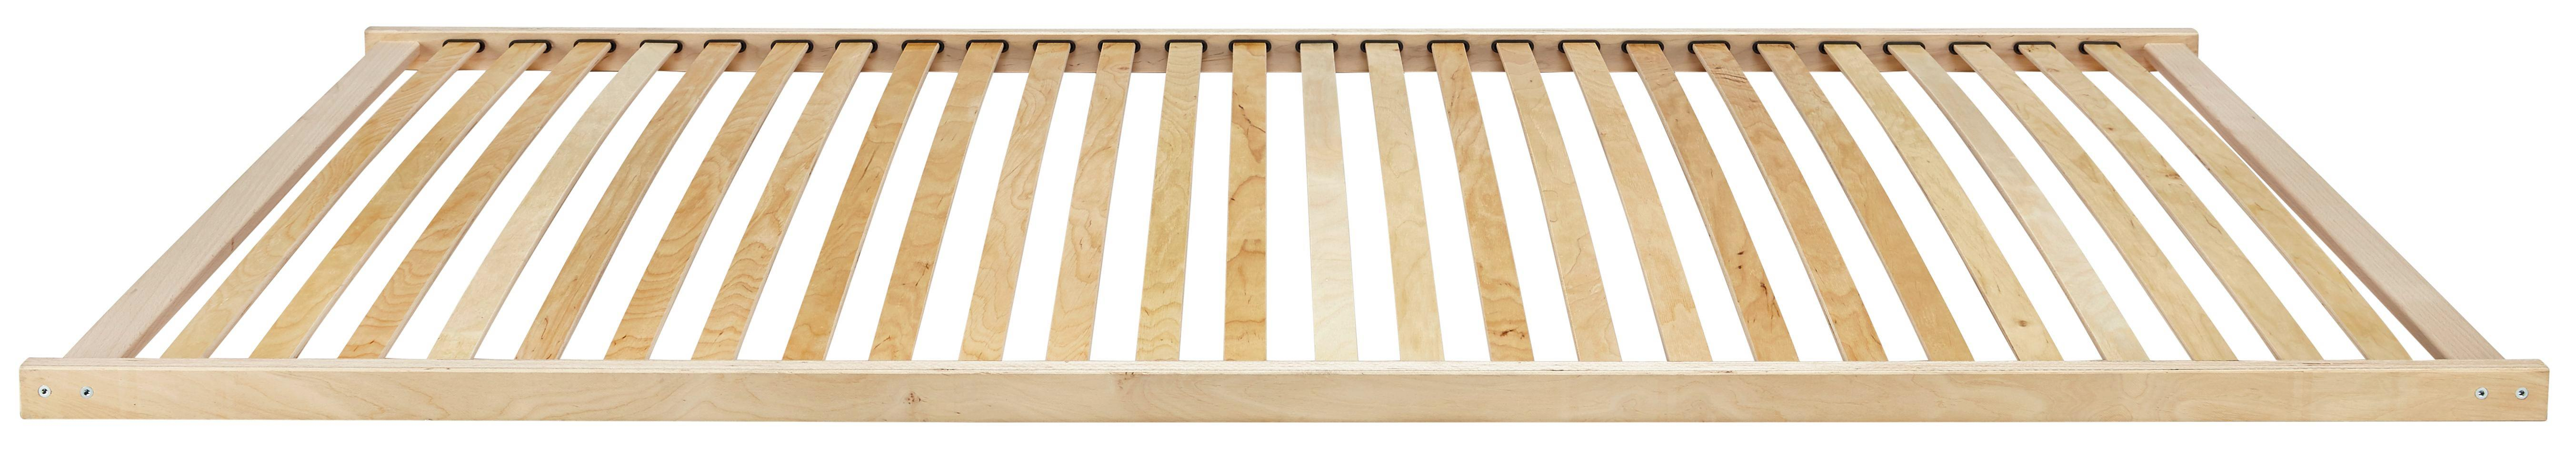 Lattenrost aus Holz, ca. 140x200cm - (140/200cm) - NADANA